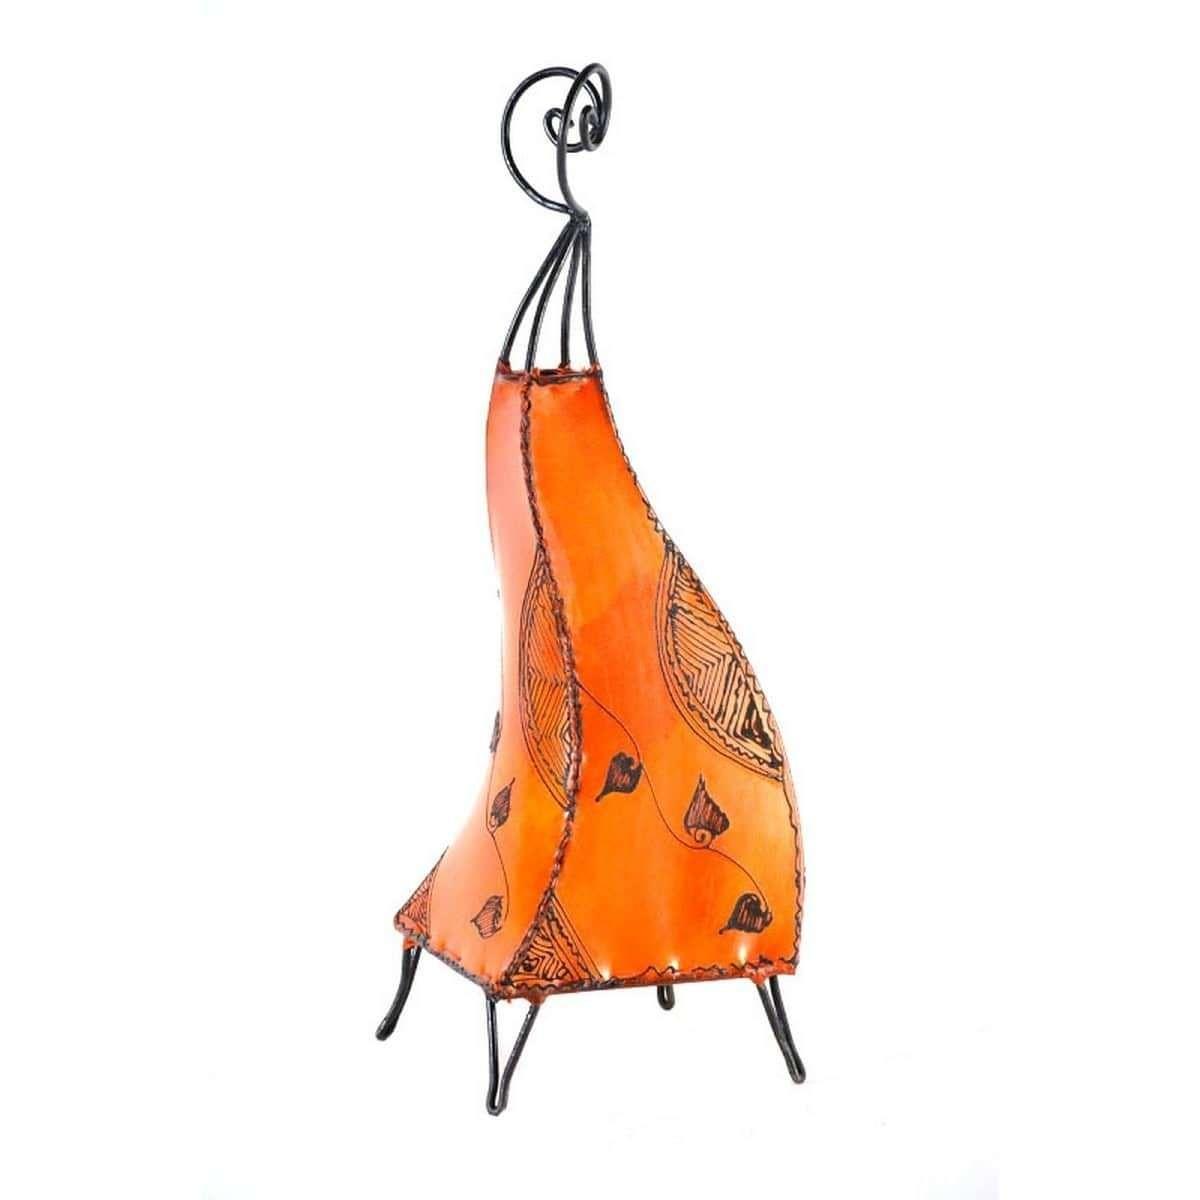 orientalische marokkanische stehlampe leder lampe hennalampe lederleuchte marrak ebay. Black Bedroom Furniture Sets. Home Design Ideas